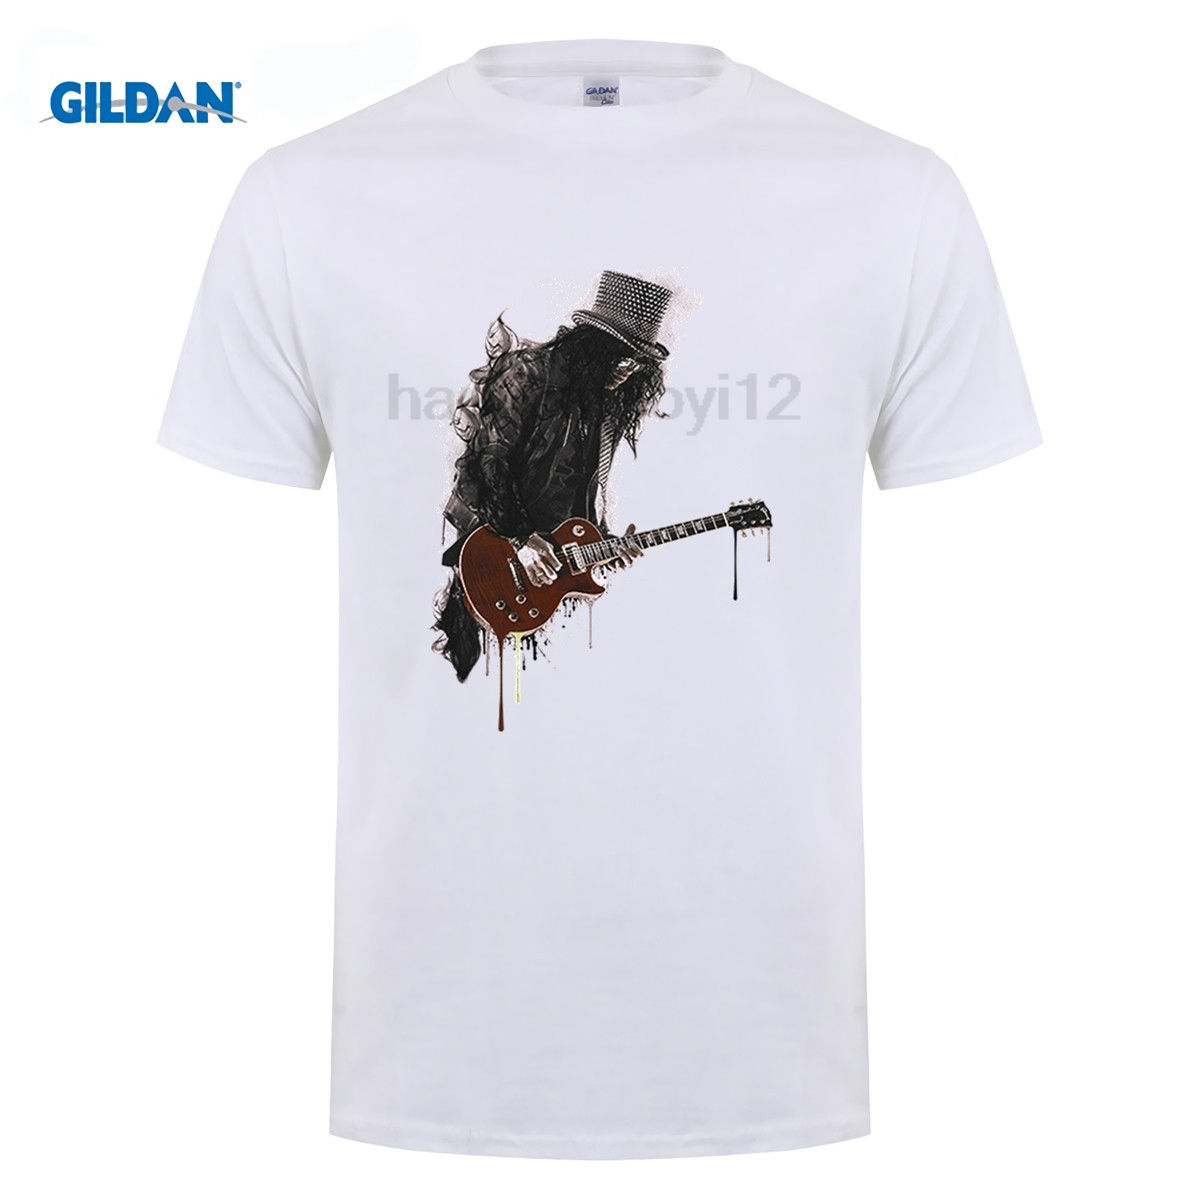 GILDAN Slash T Shirt for Men Guitar Rock Ink Style Gun Music Roses Man Short Sleeve T-Shirt Best Selling Tops Funny Tees